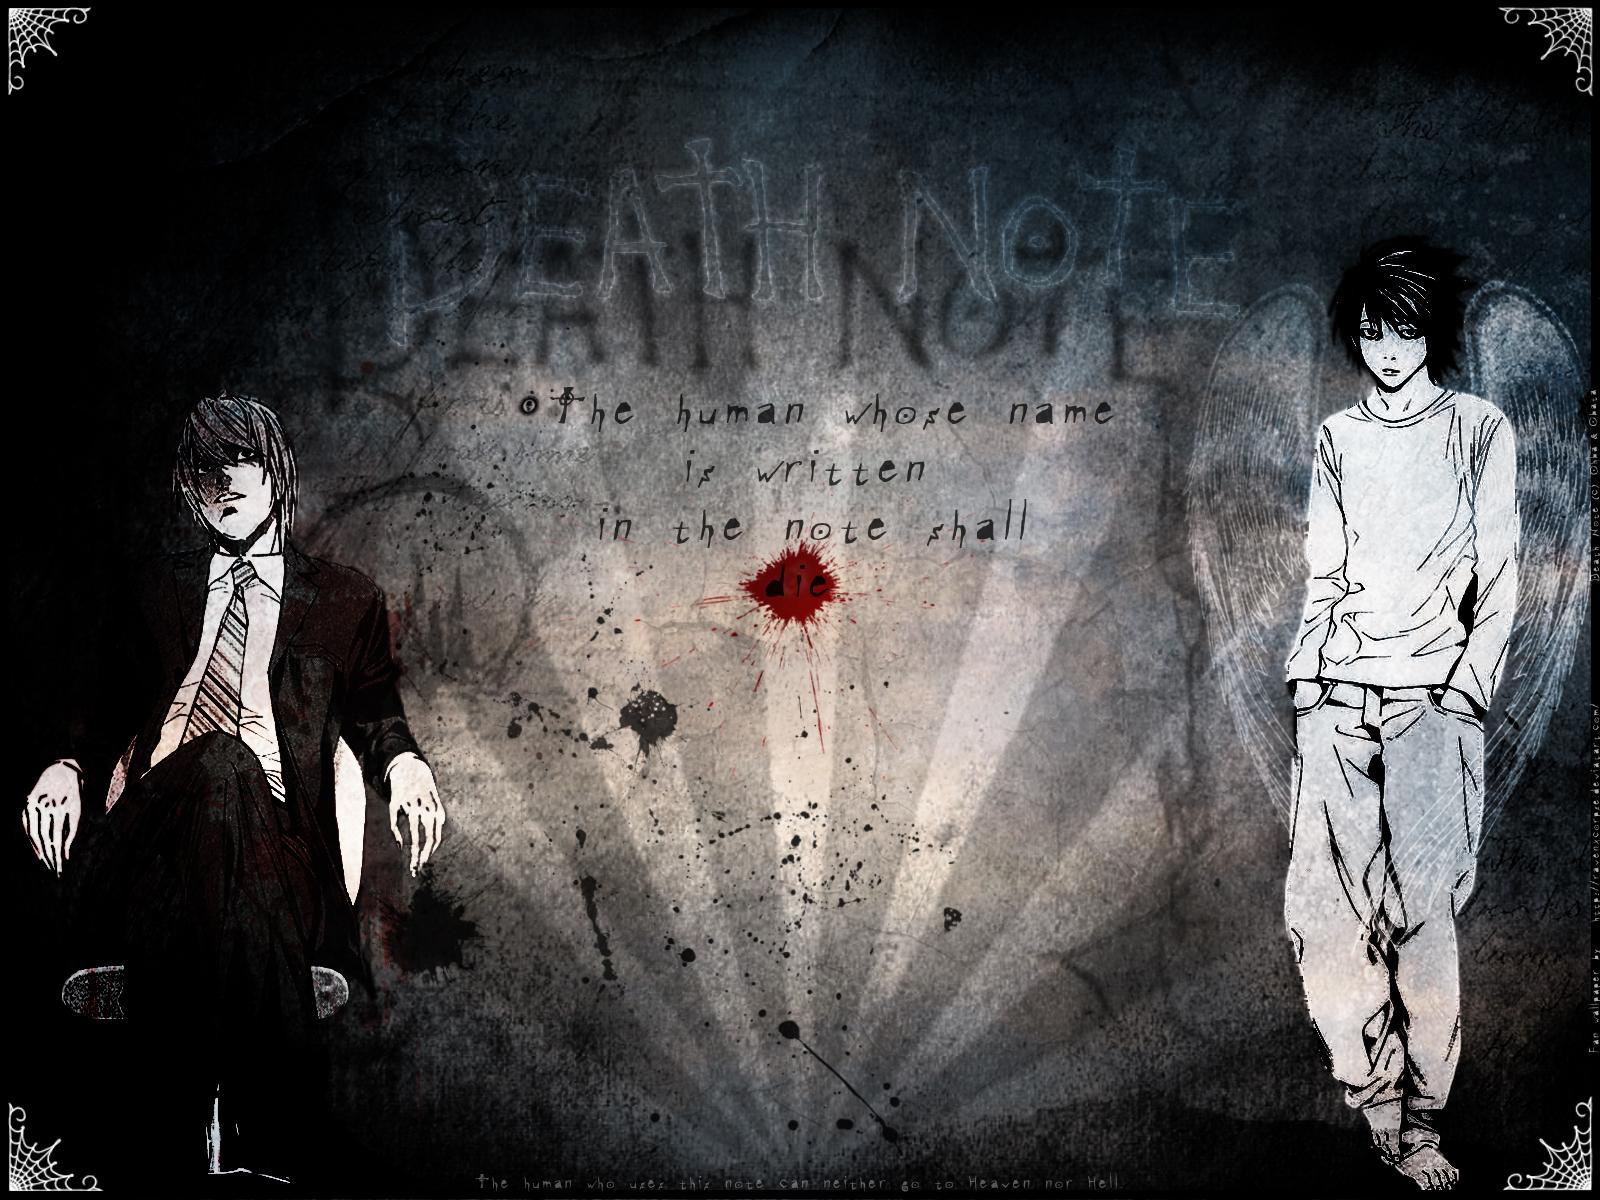 http://2.bp.blogspot.com/-q5DRCam31Zg/UILgDKyEYUI/AAAAAAAAAt0/rJTmgUI4-VQ/s1600/Death-Note-Wallpaper-bn-01.jpg